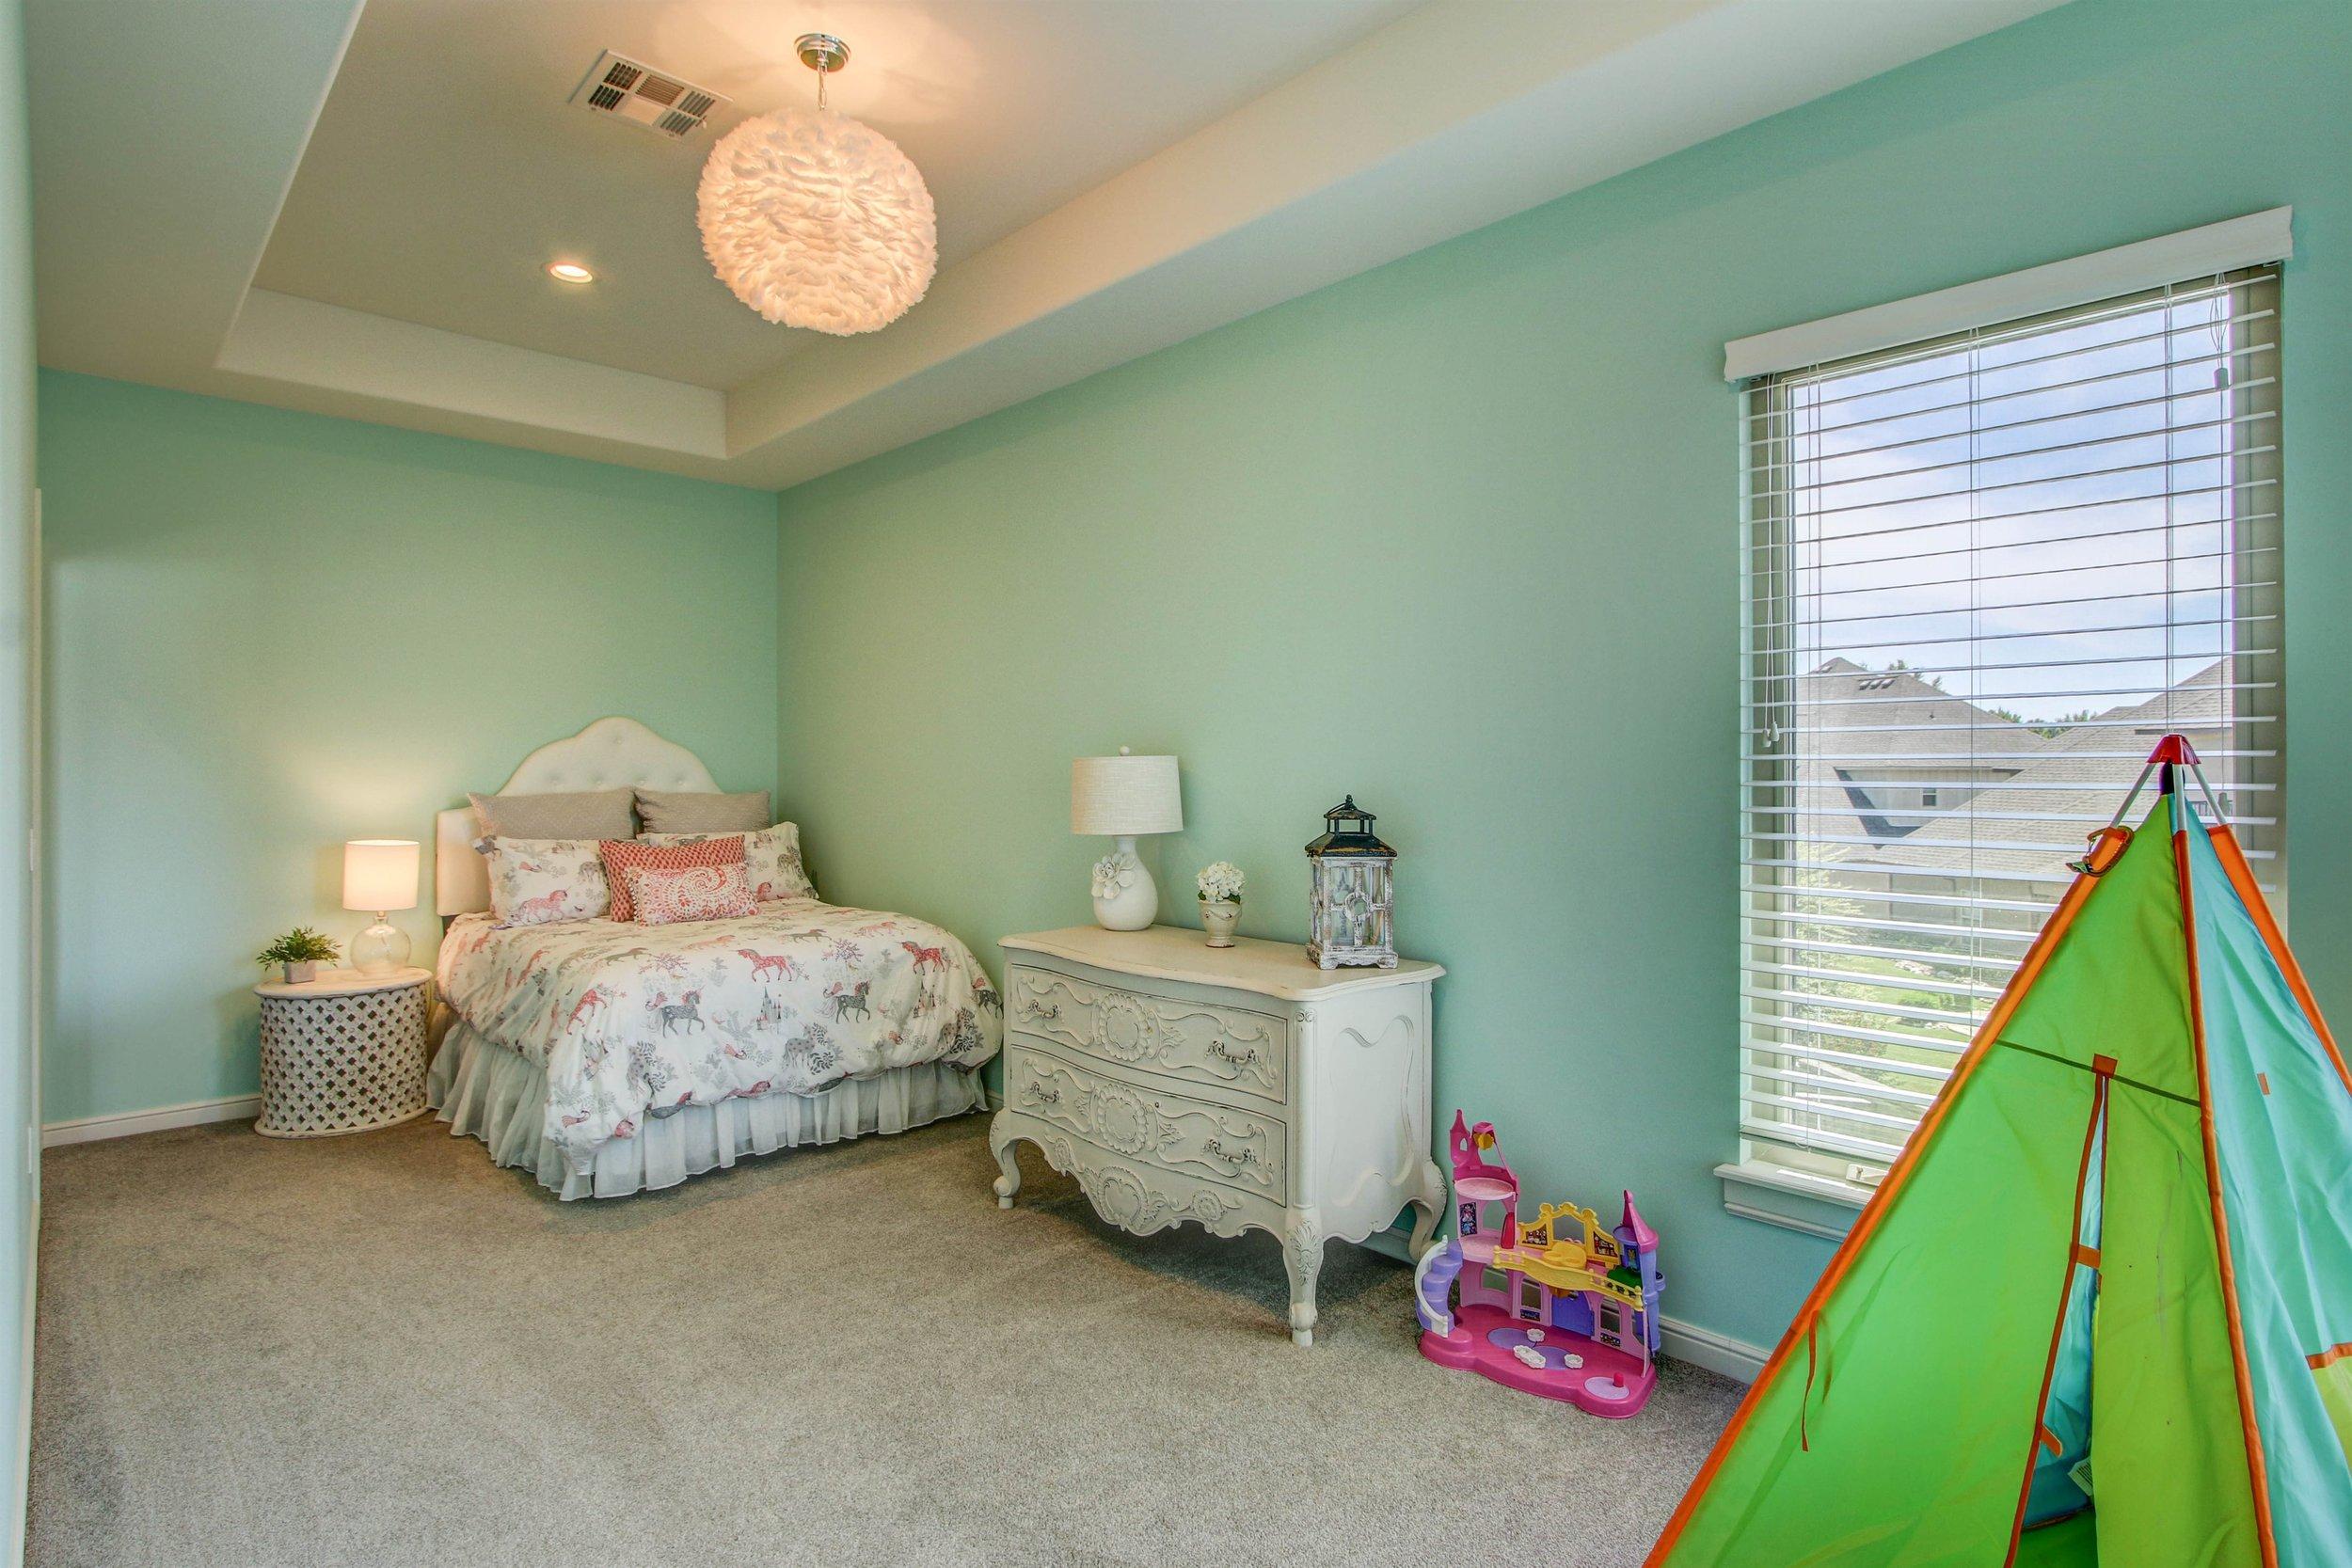 026_Bedroom.jpg